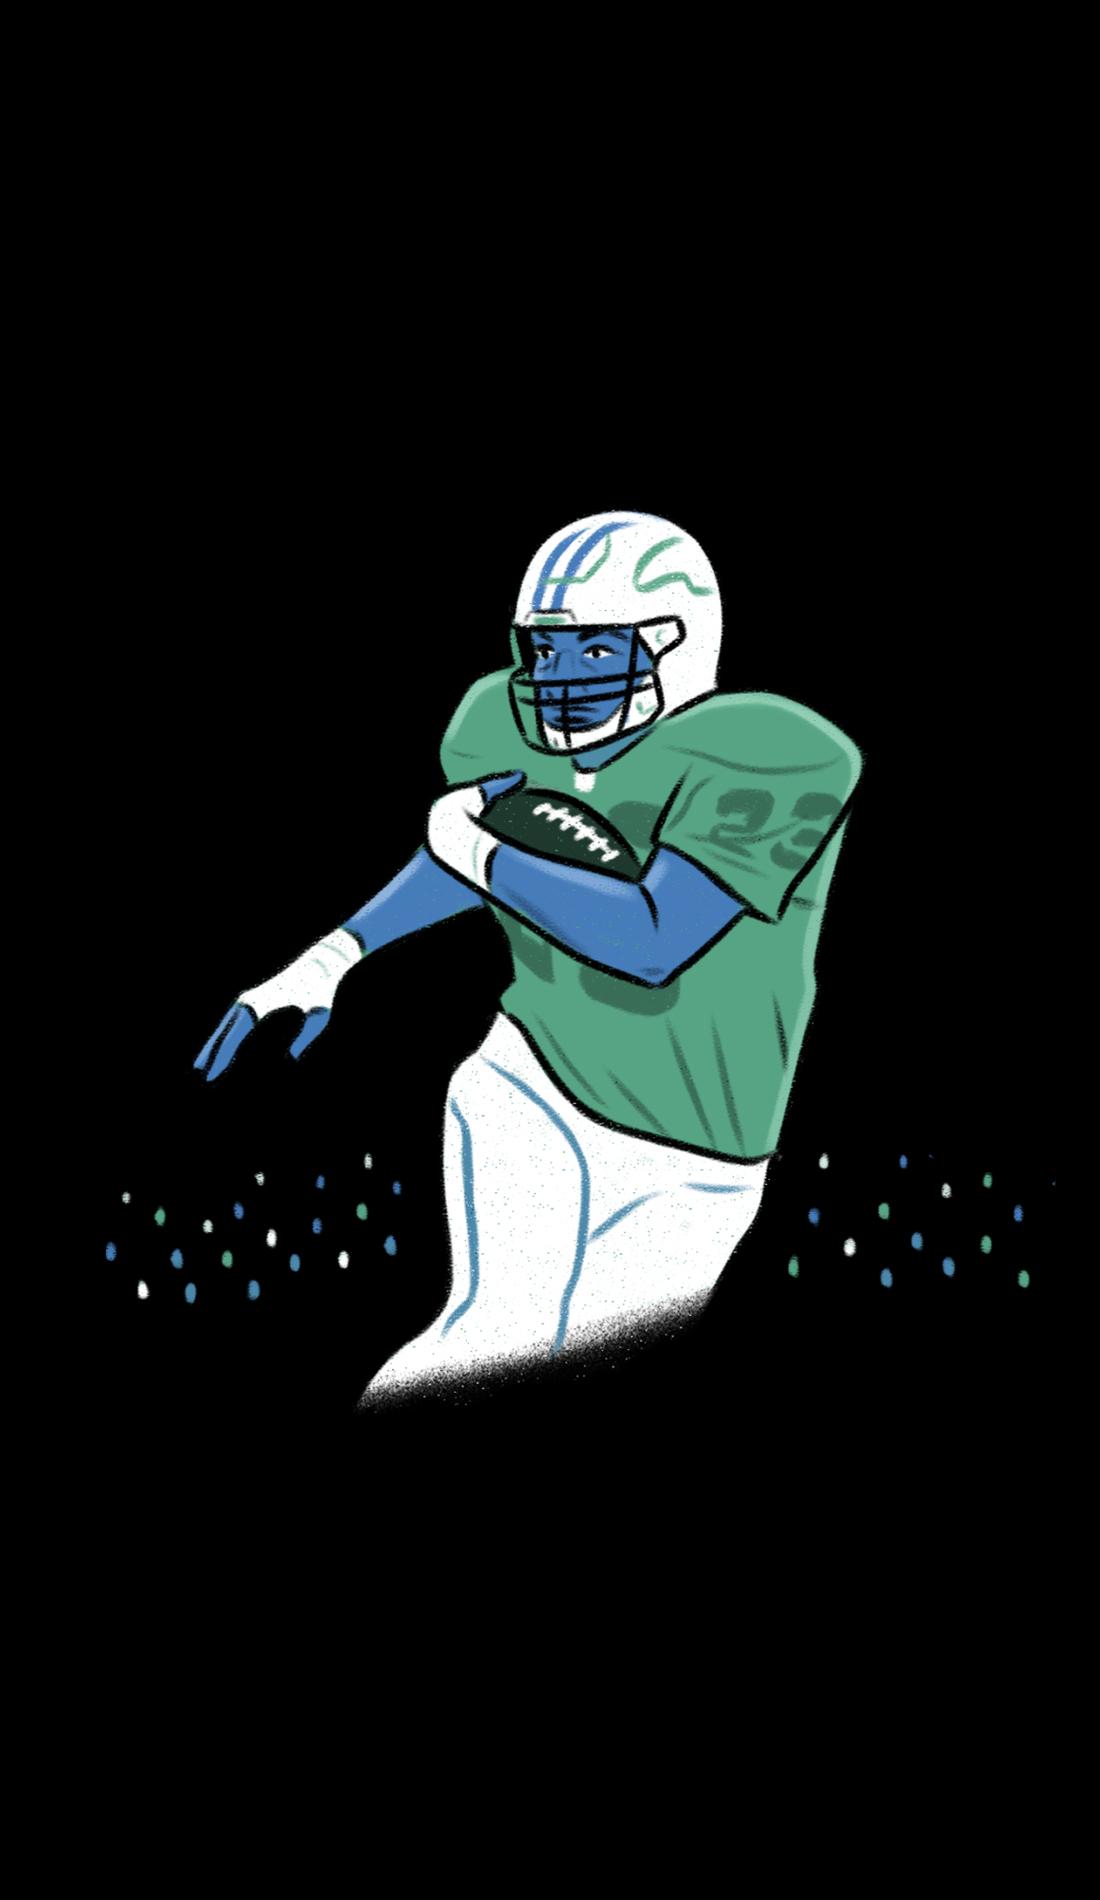 A Missouri State Bears Football live event